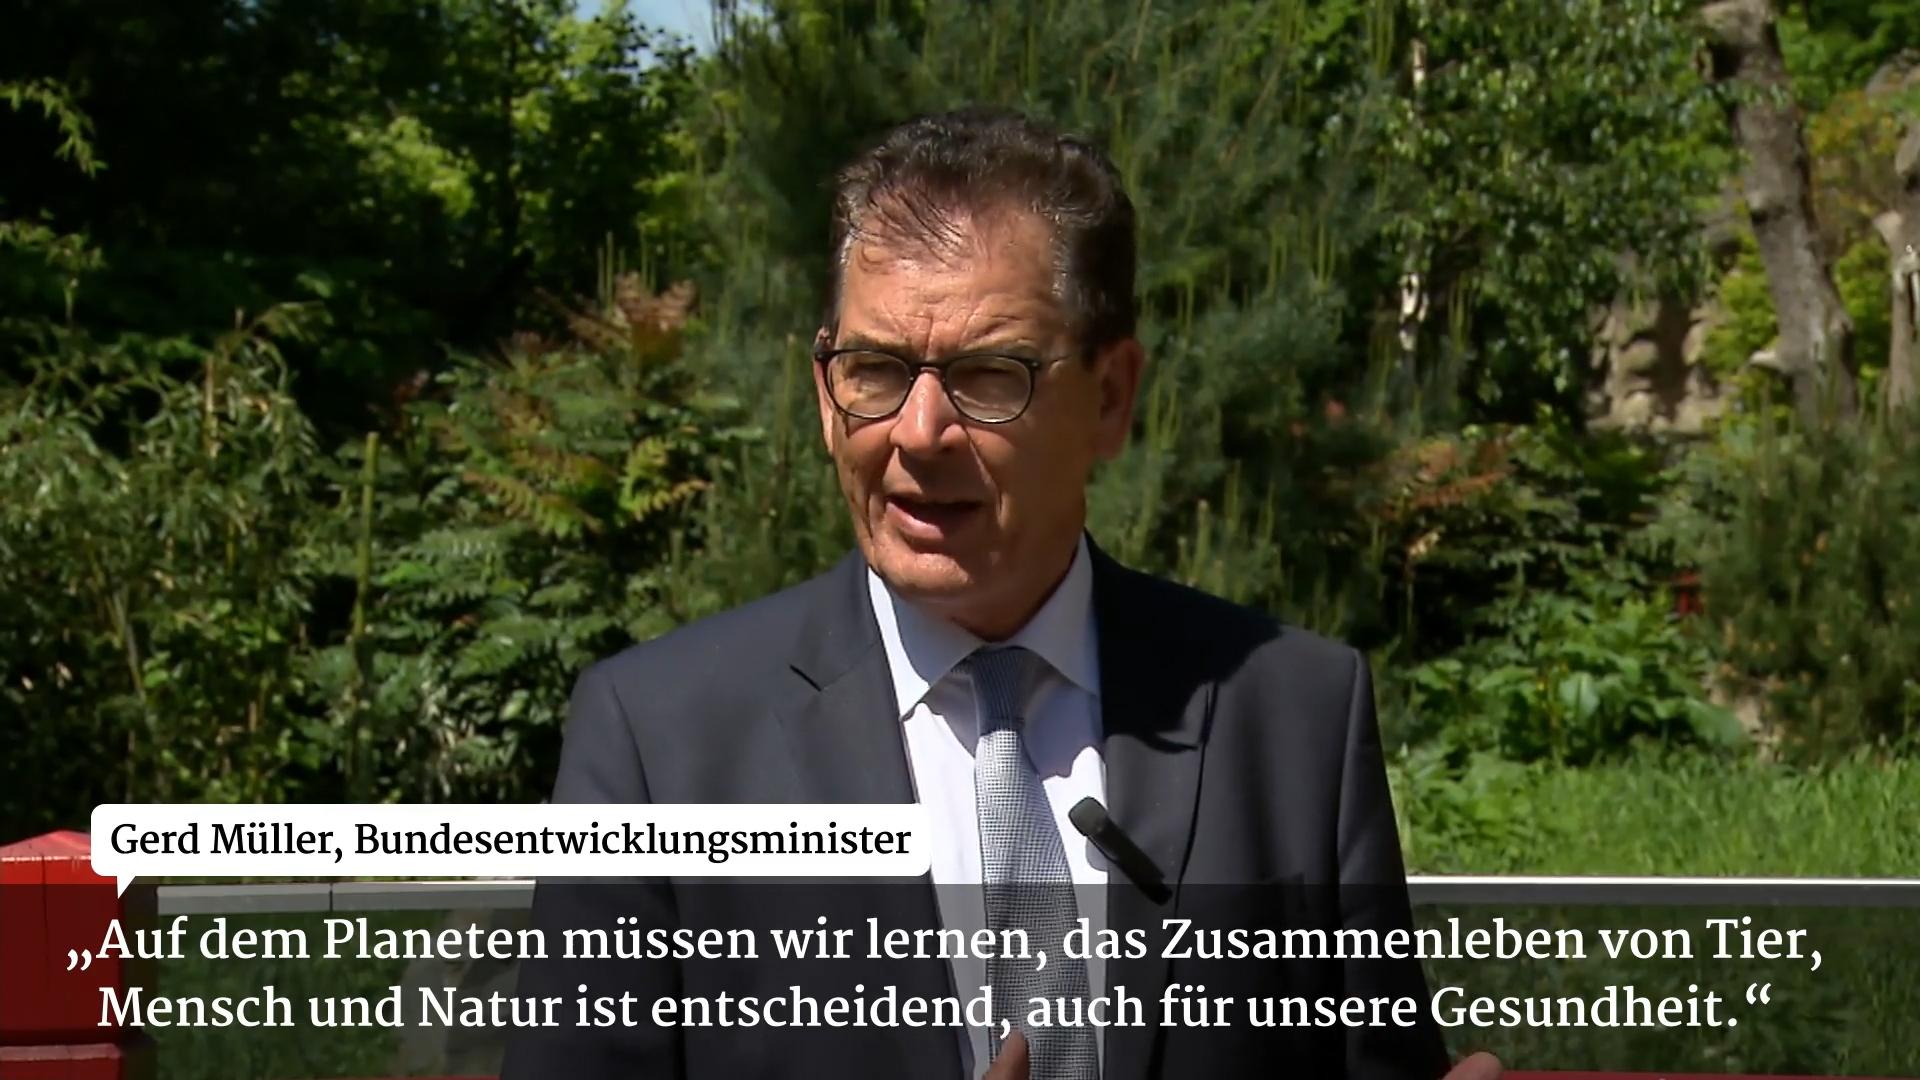 Standbild aus dem RTL-Video vom 22.05.2020